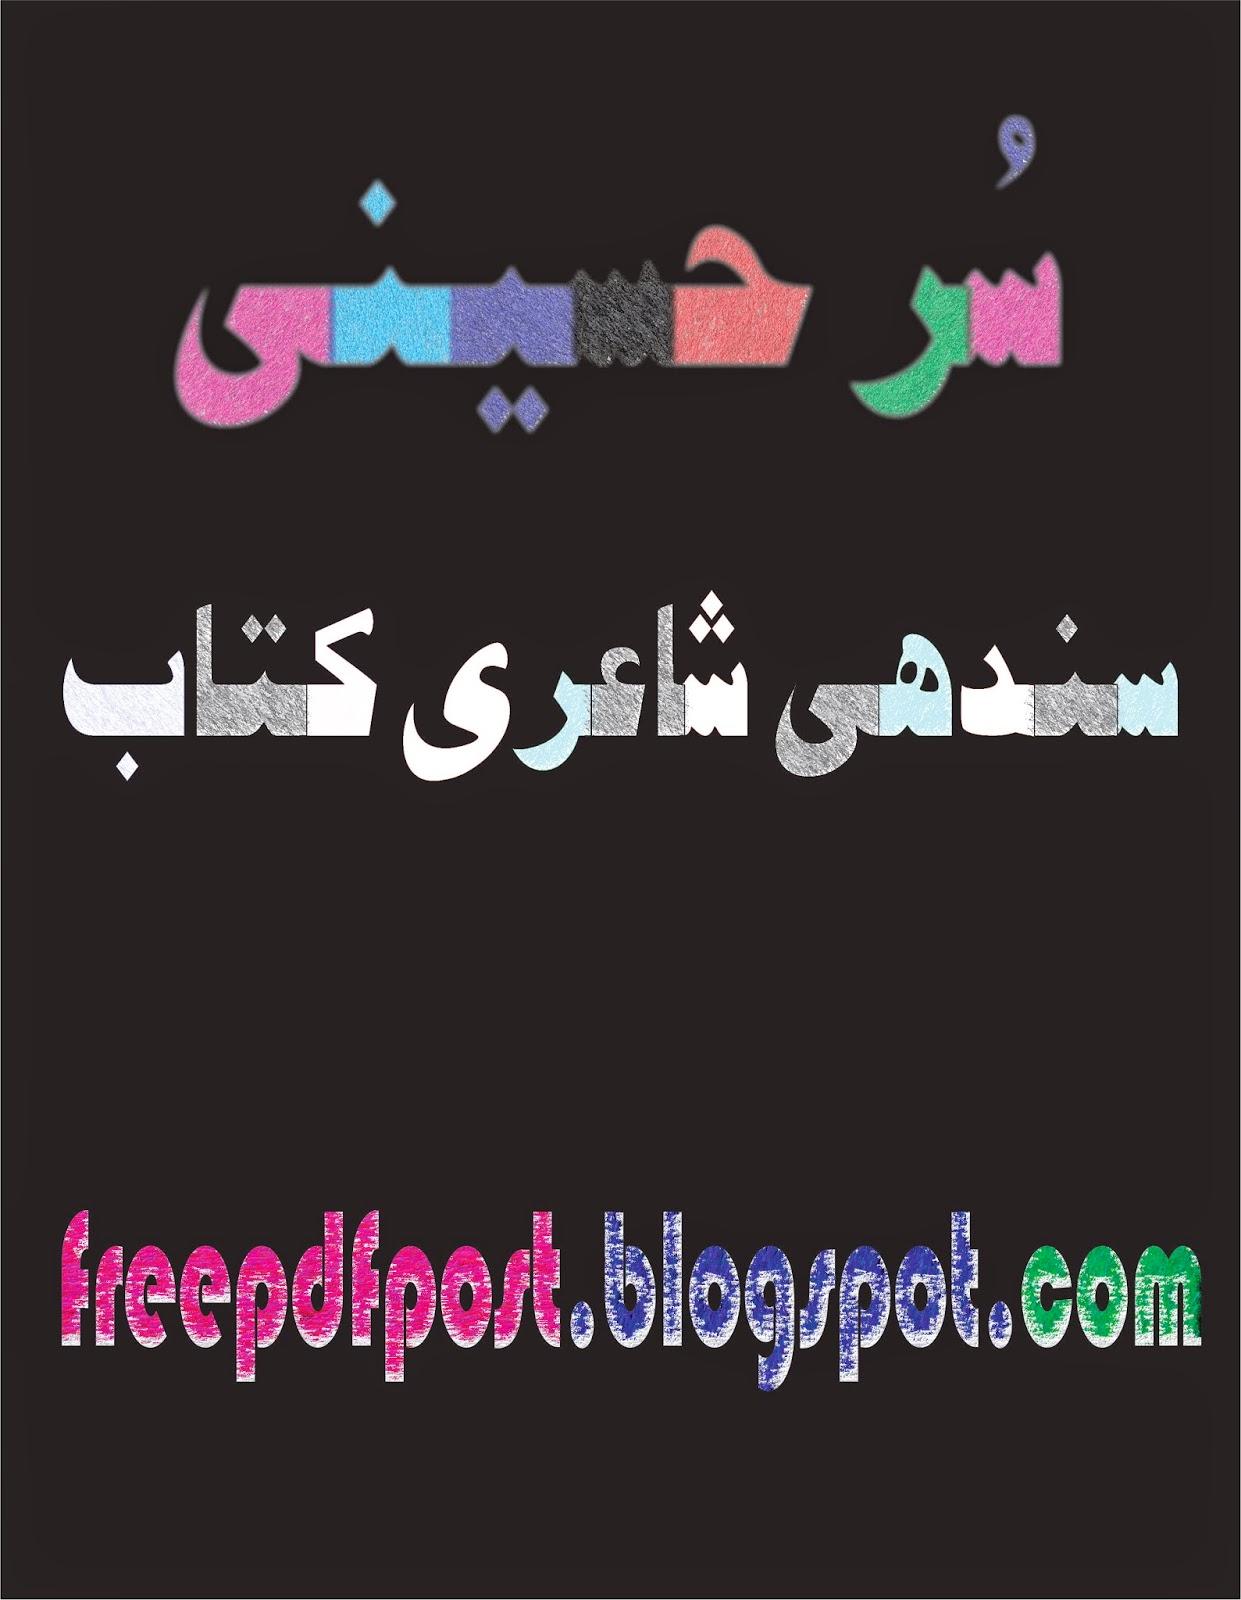 http://www.mediafire.com/view/9eth4rb5yxbb9td/سُر_حسينيSindhi_POetry.pdf